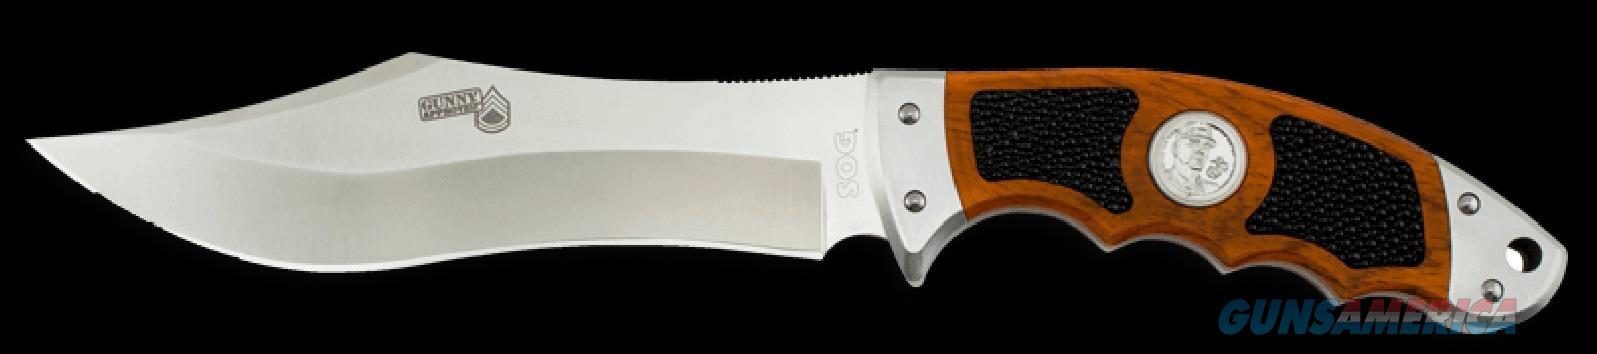 Gunny Fixed Blade (GFX01-L) #252 of 1,000  Non-Guns > Knives/Swords > Knives > Fixed Blade > Hand Made